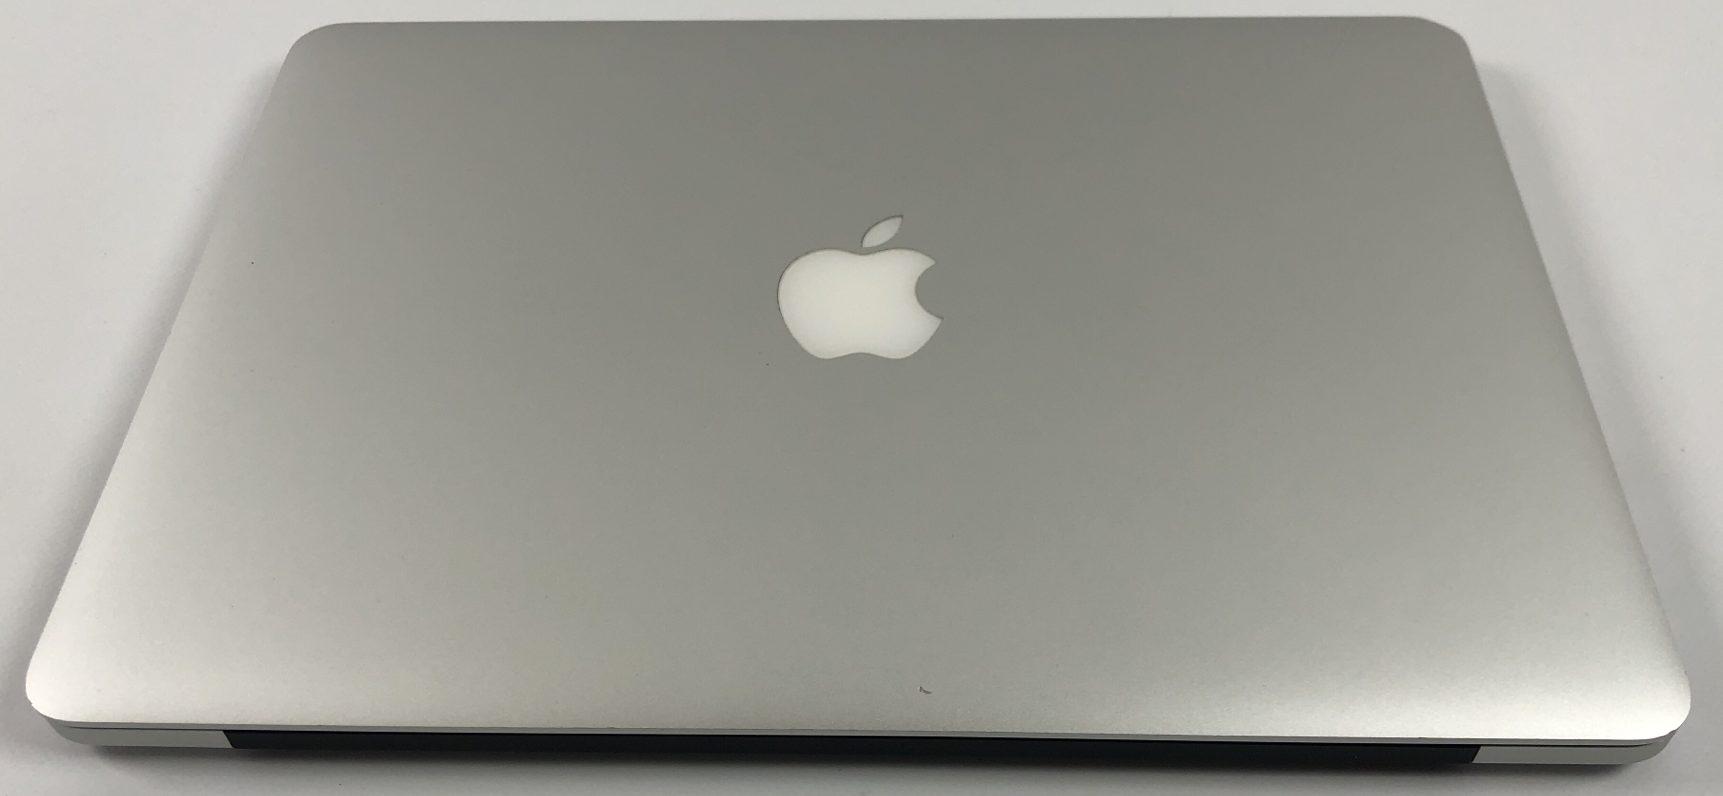 "MacBook Pro Retina 13"" Early 2015 (Intel Core i7 3.1 GHz 16 GB RAM 512 GB SSD), Intel Core i7 3.1 GHz, 16 GB RAM, 512 GB SSD, Kuva 2"